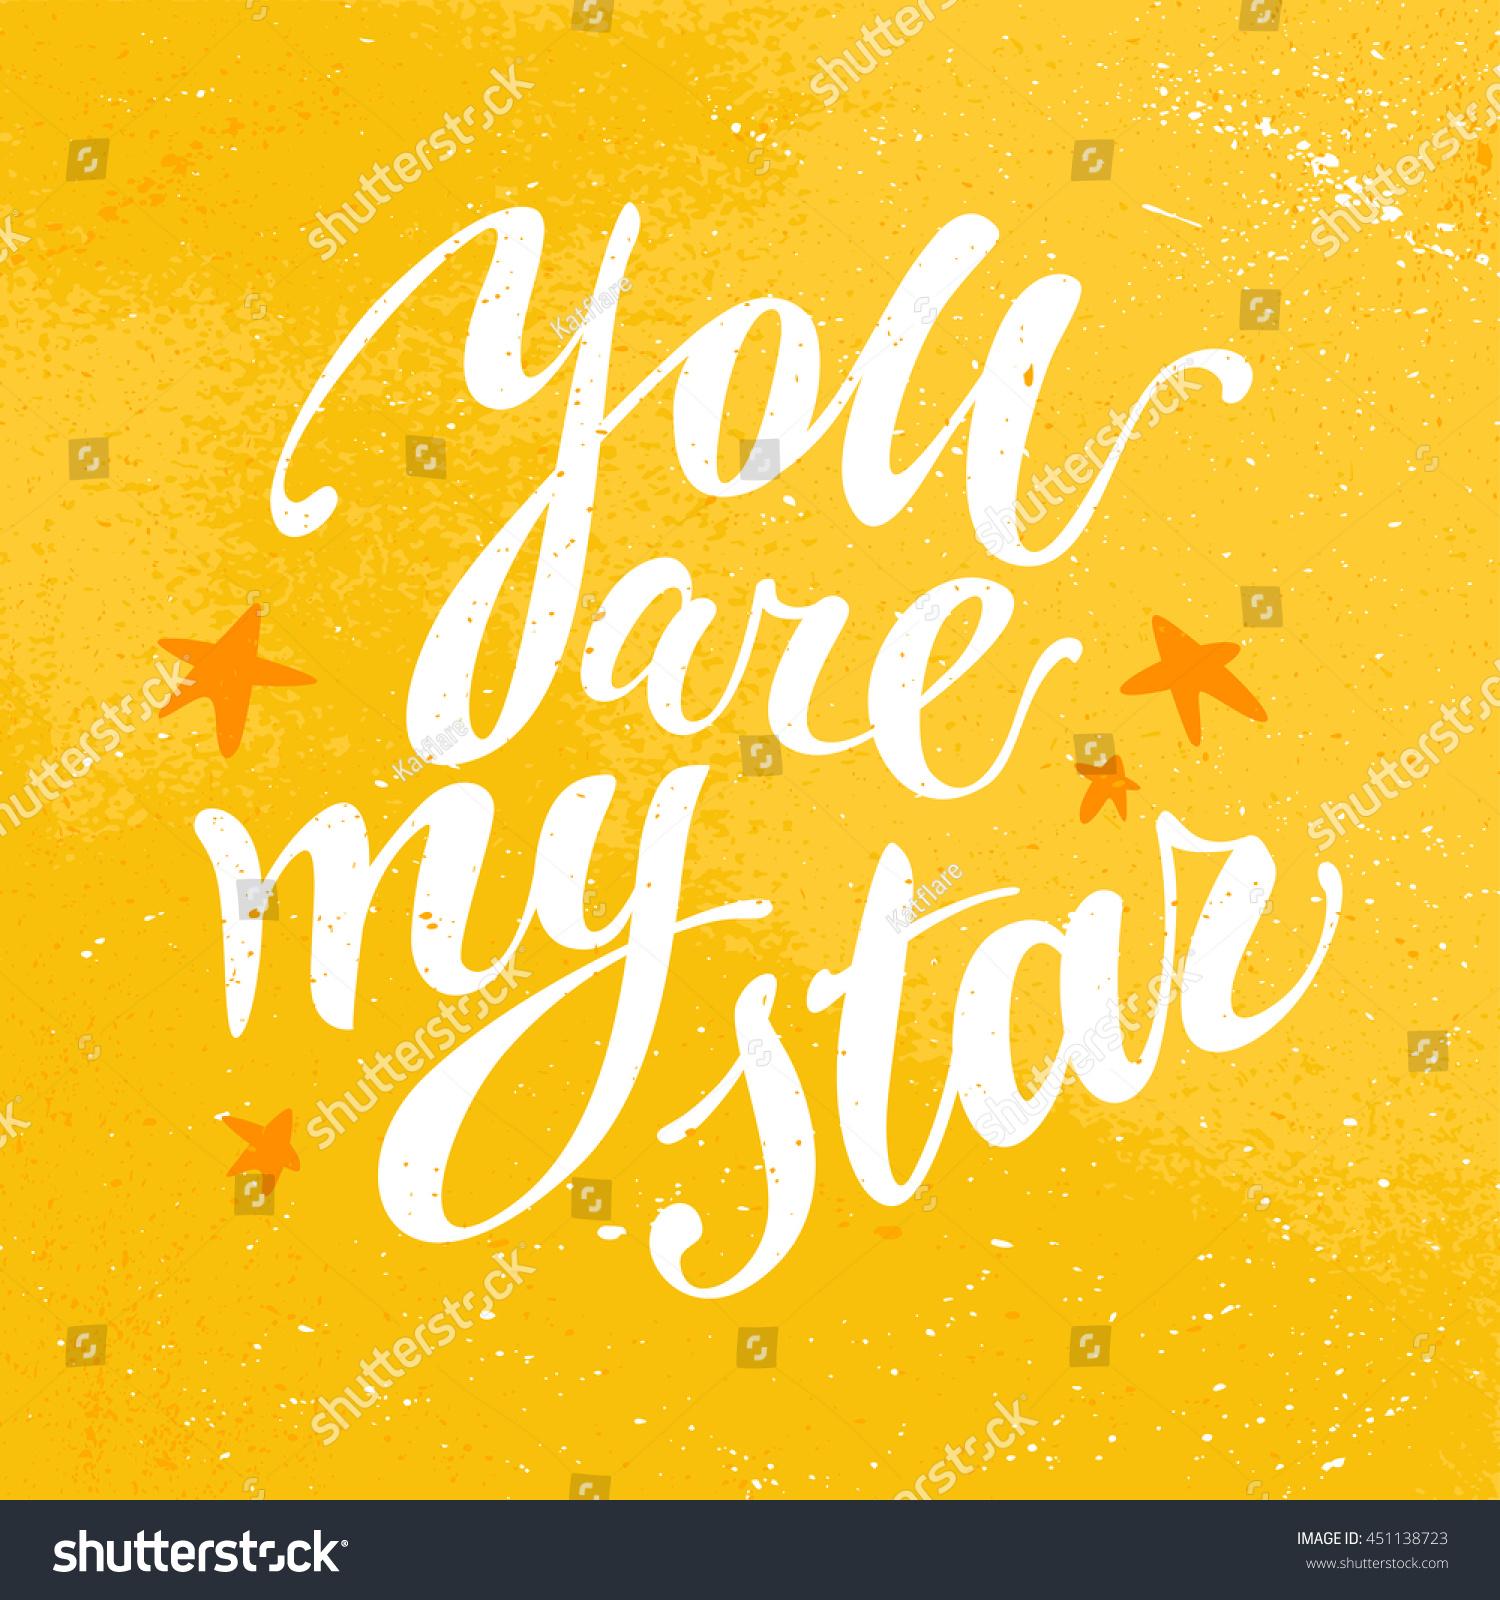 Vector Hand Written Text Message Isolated Love Card Congratulation